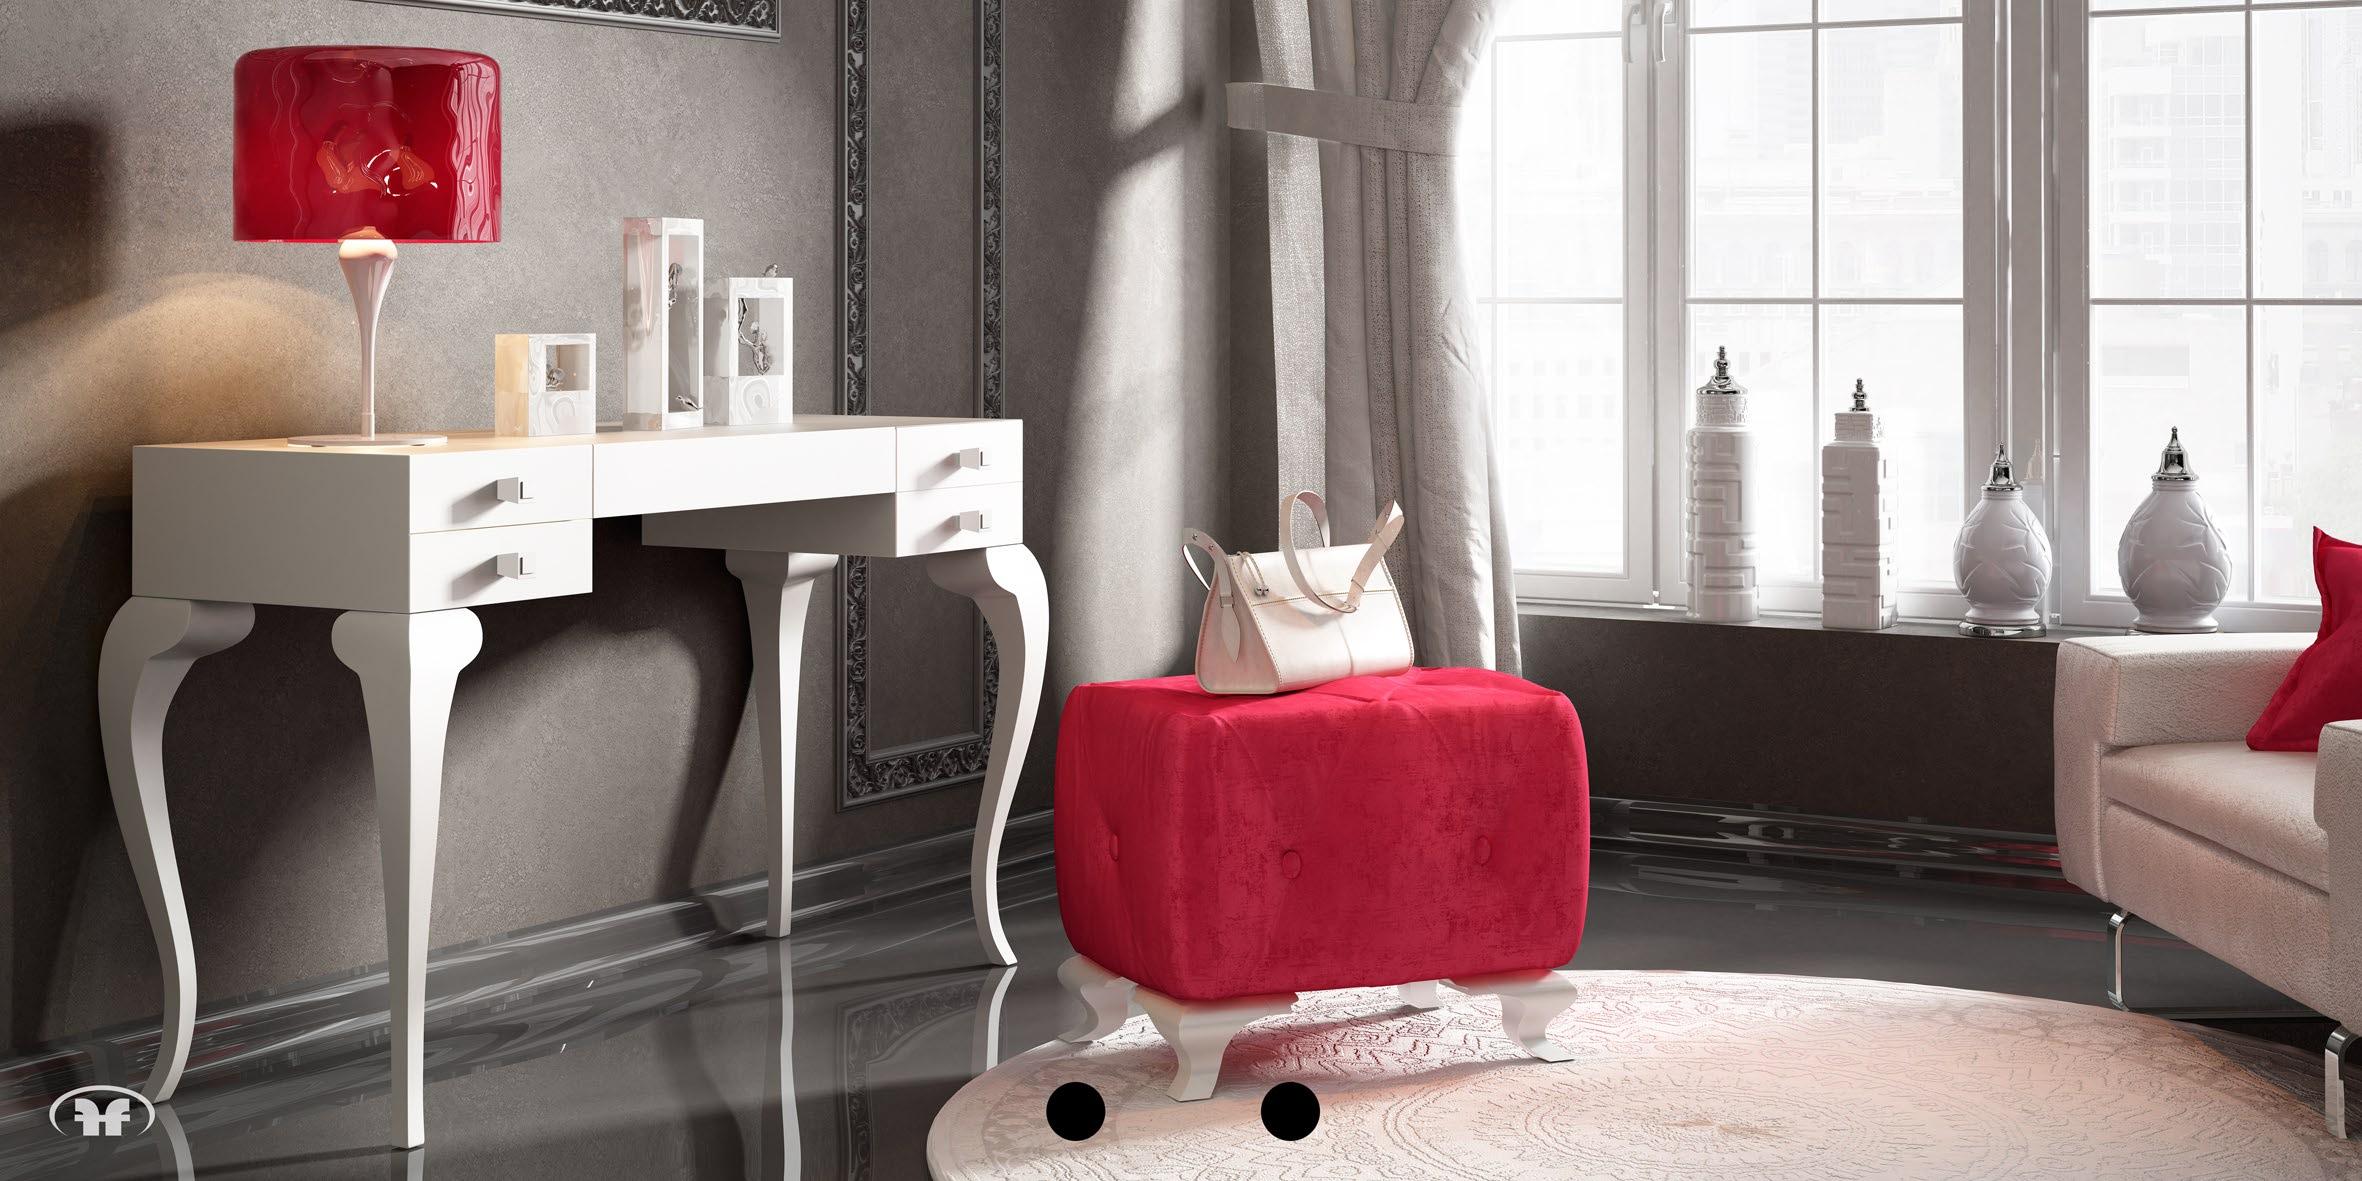 tocadores-Franco-muebles-paco-caballero-1220-5caf4b5959788